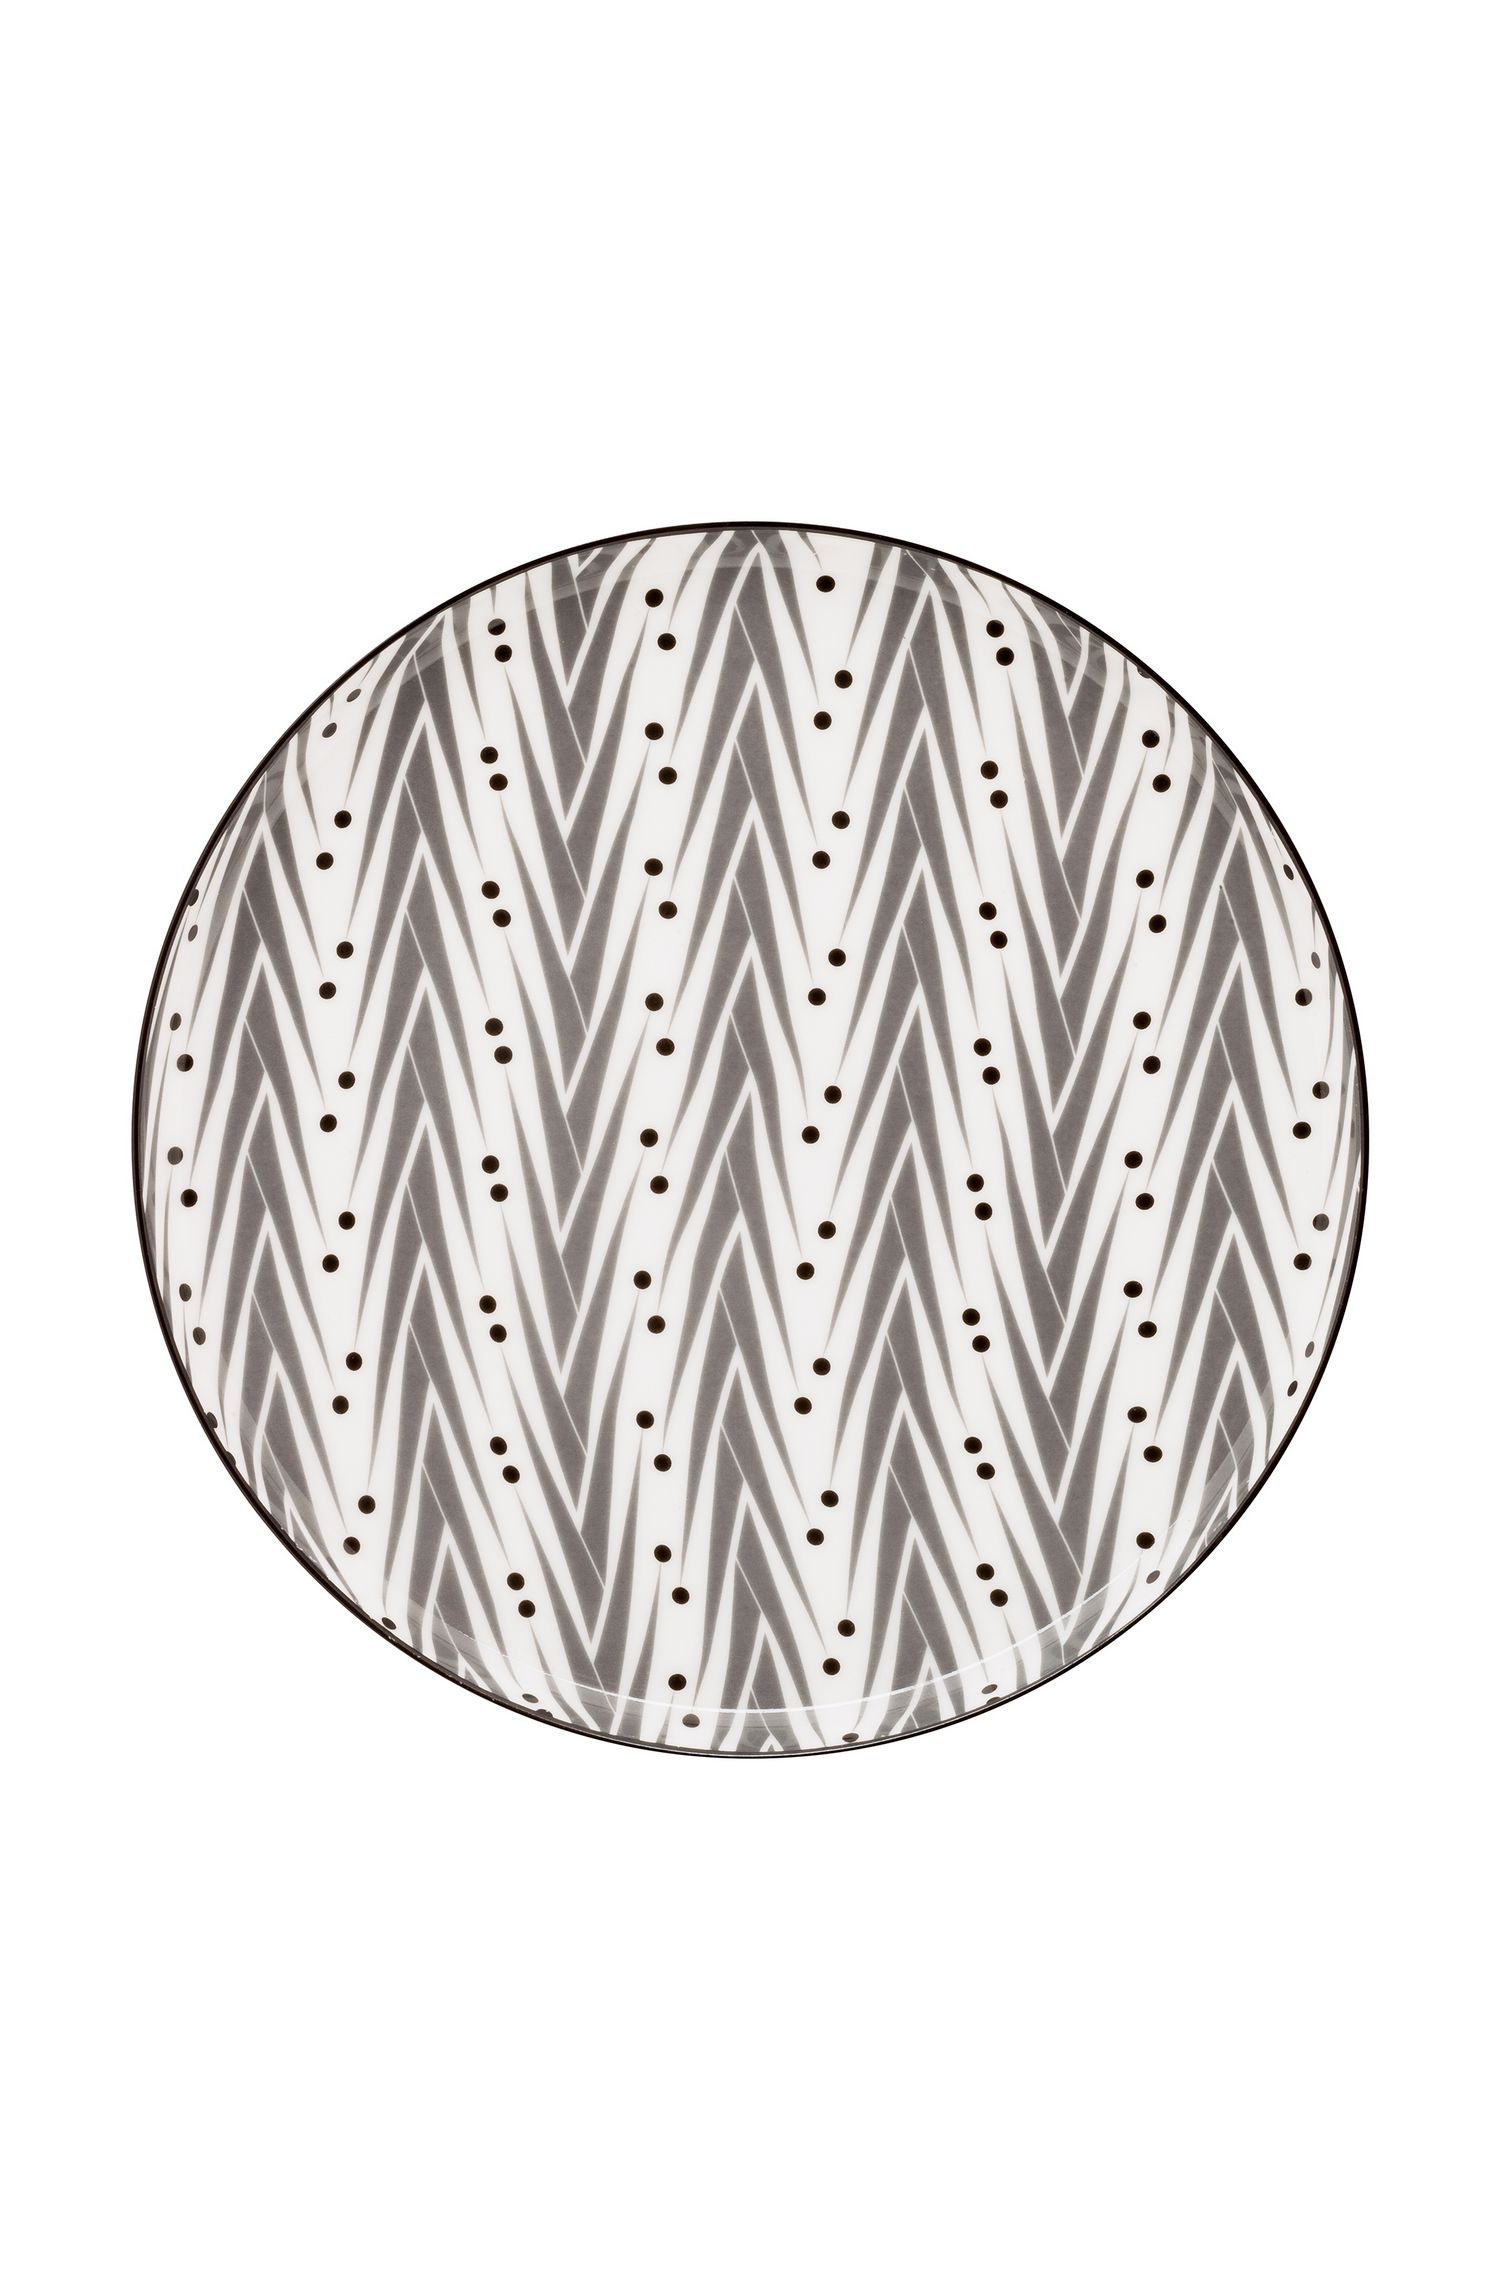 цена на Набор тарелок Designed For Living Lemon Grass, 53.001.003, серый, 2 шт